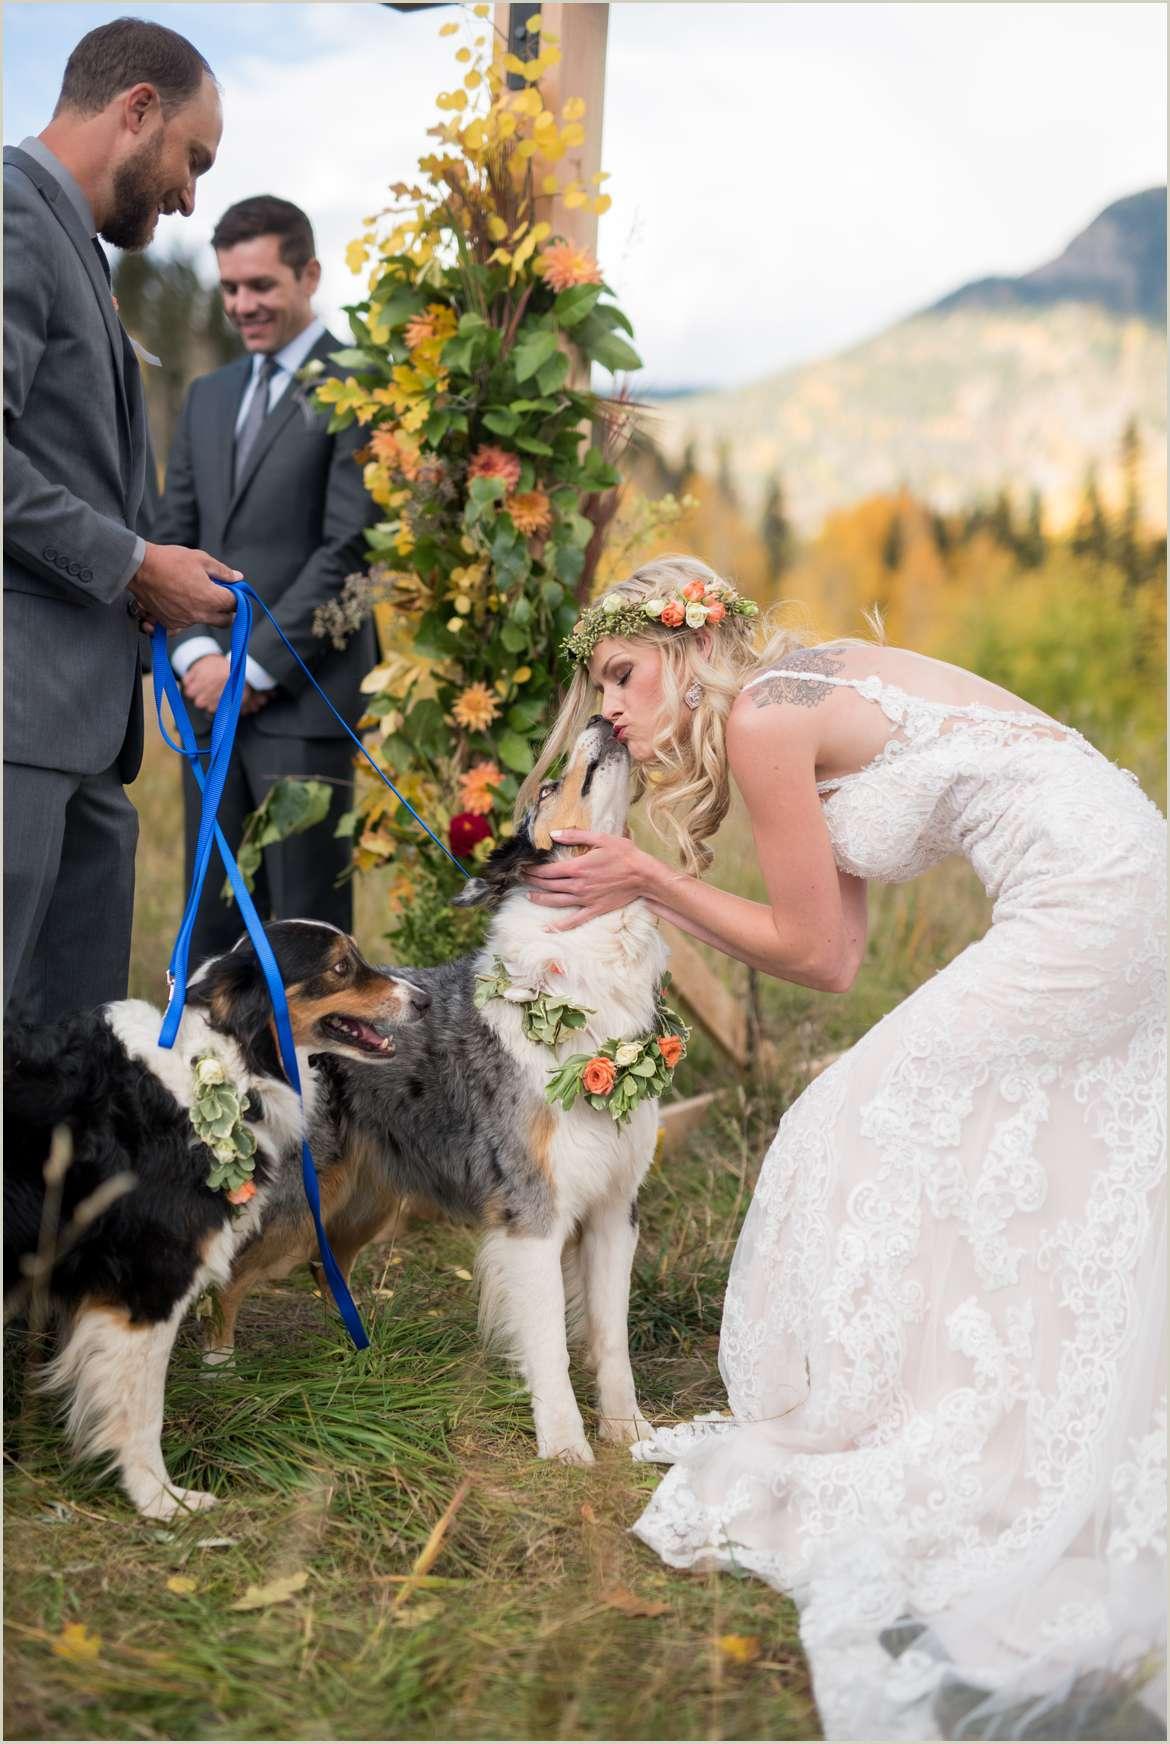 dog gives bride a kiss during wedding